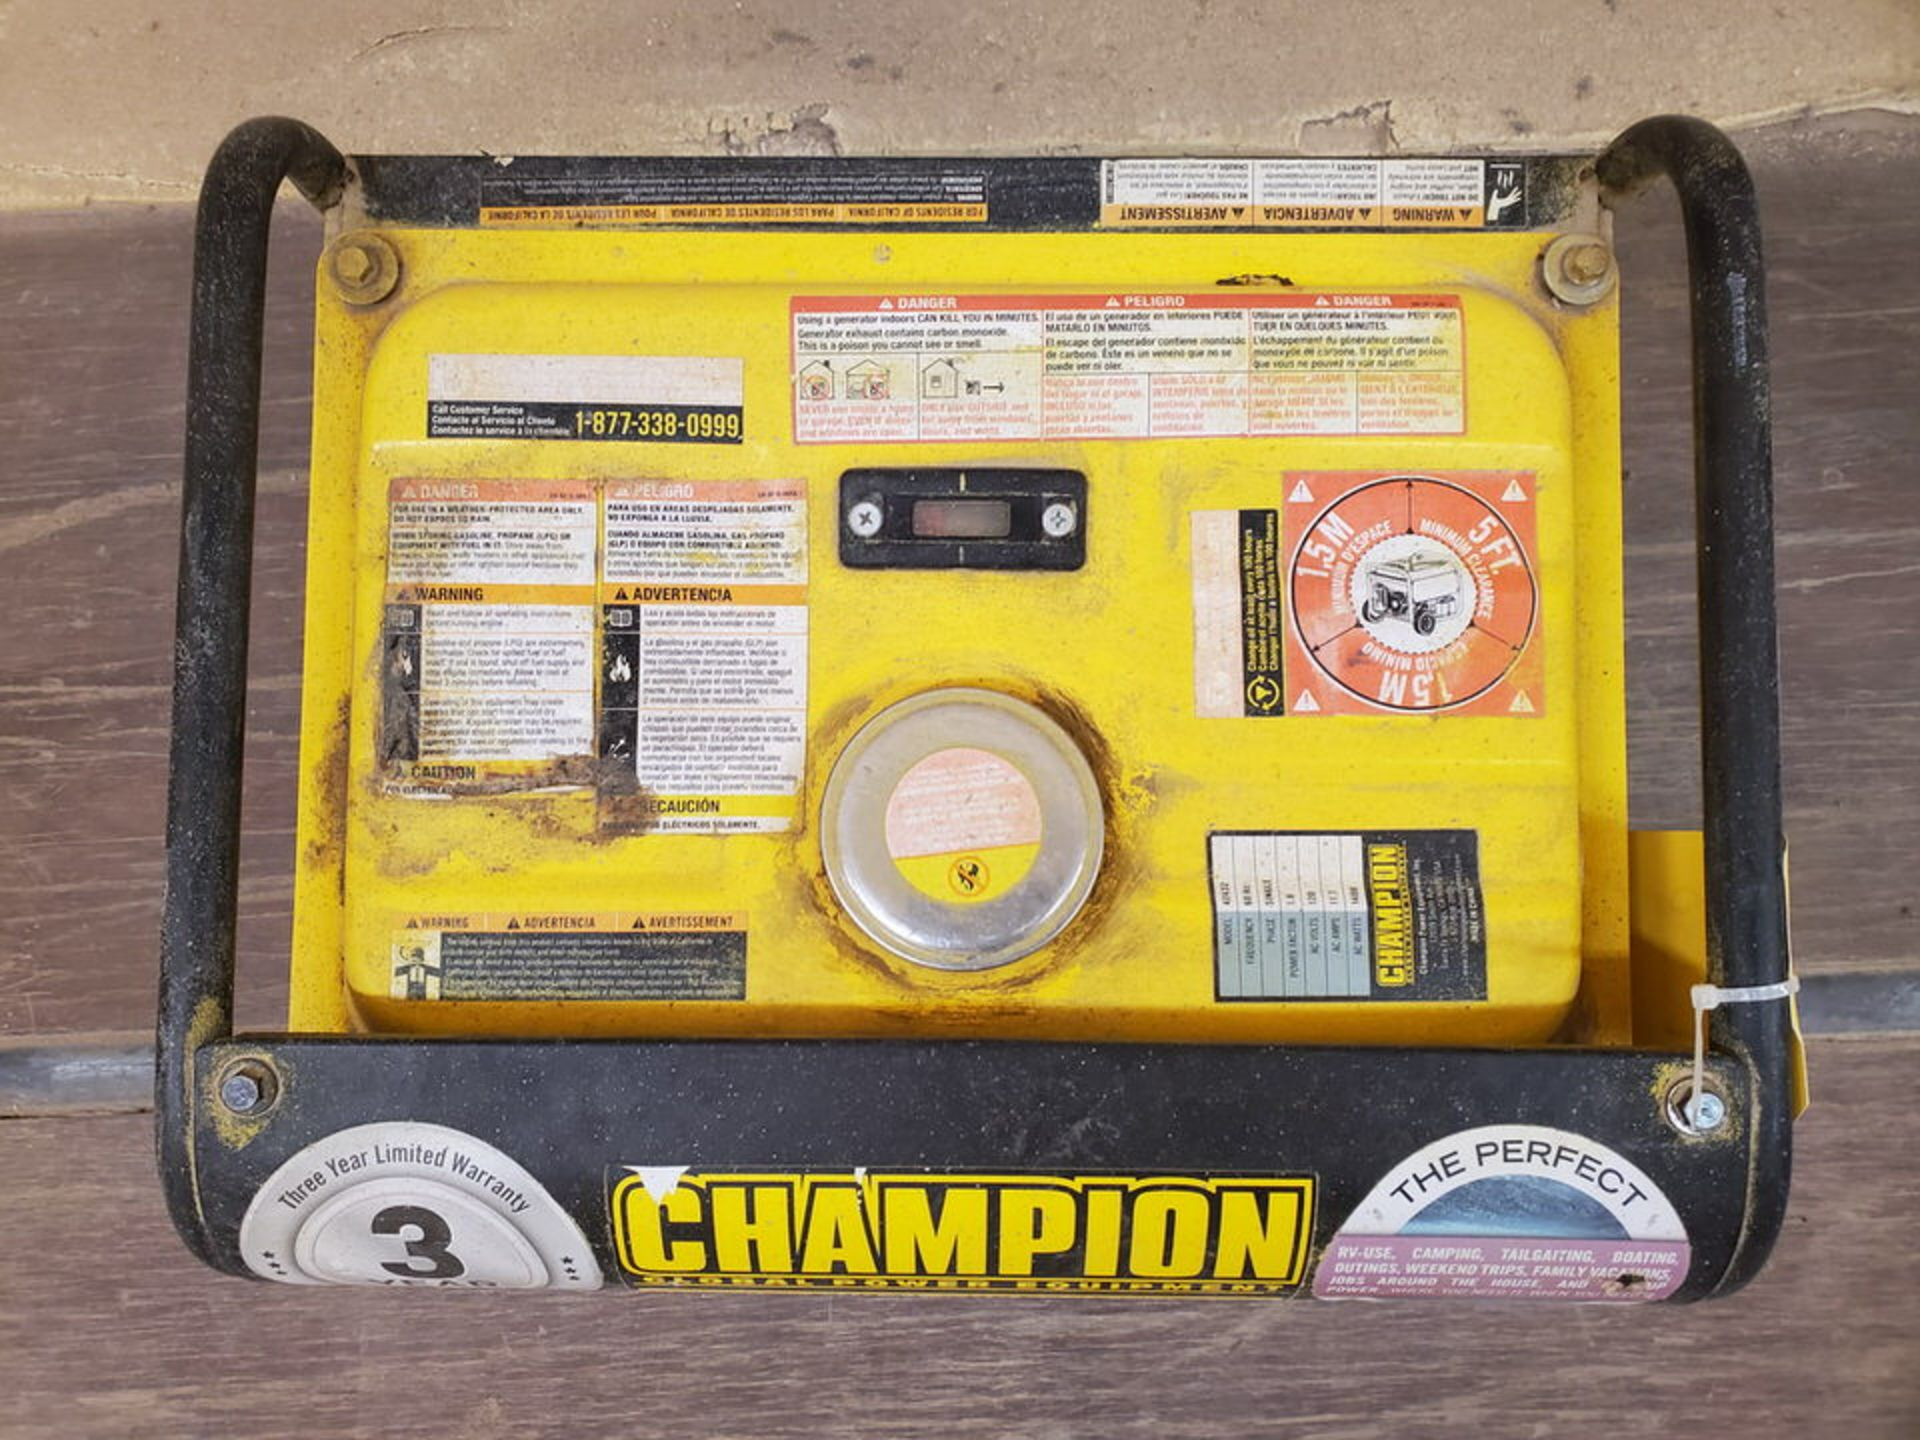 Champion 42432 Portable Generator 1400W, W/ 80cc Engine, 1PH, 60HZ, 120V, 11.7A - Image 6 of 7